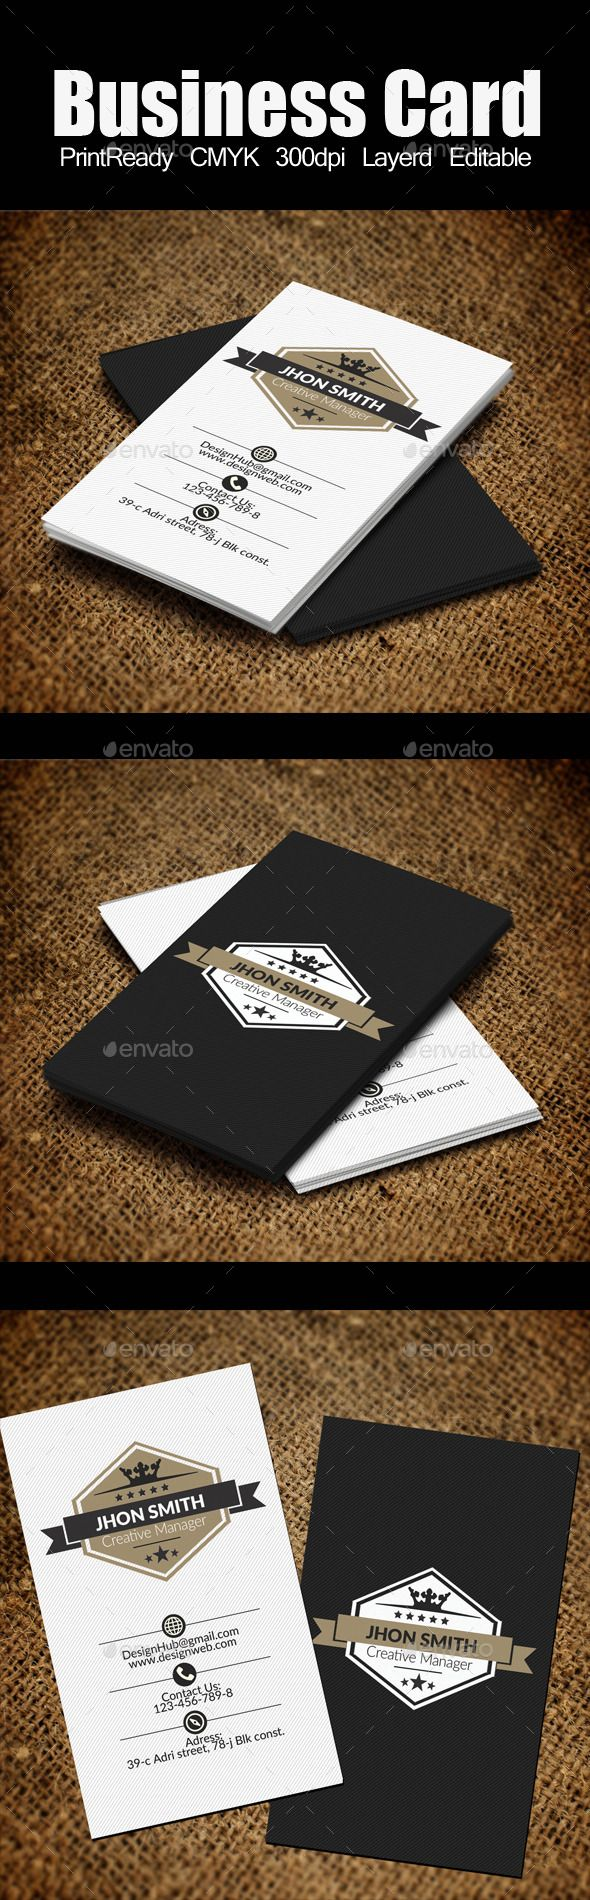 Best 25+ Vintage business cards ideas on Pinterest | Leather ...